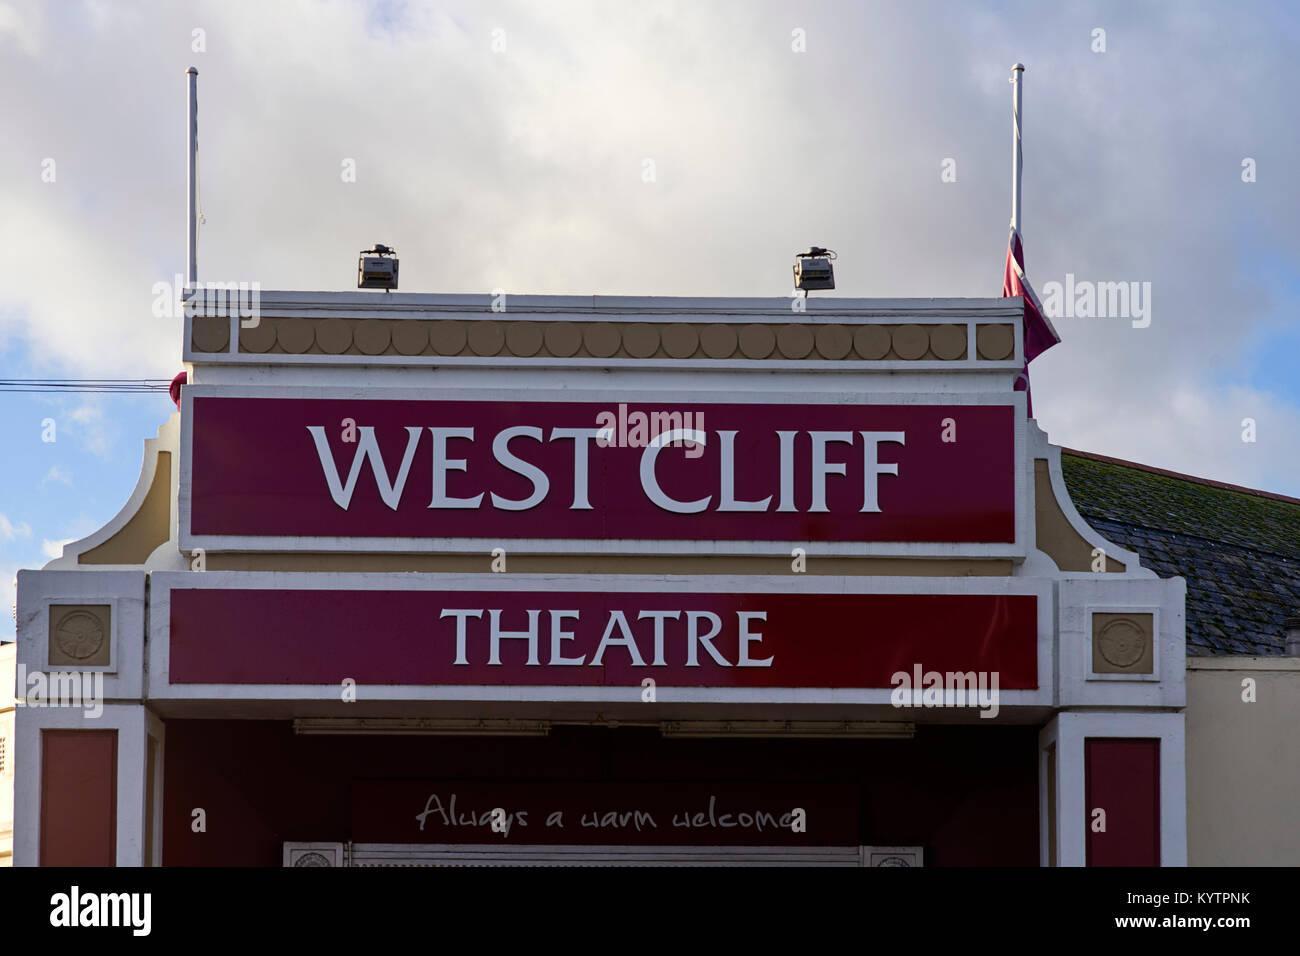 West Cliff theatre in Clacton, Essex sign - Stock Image